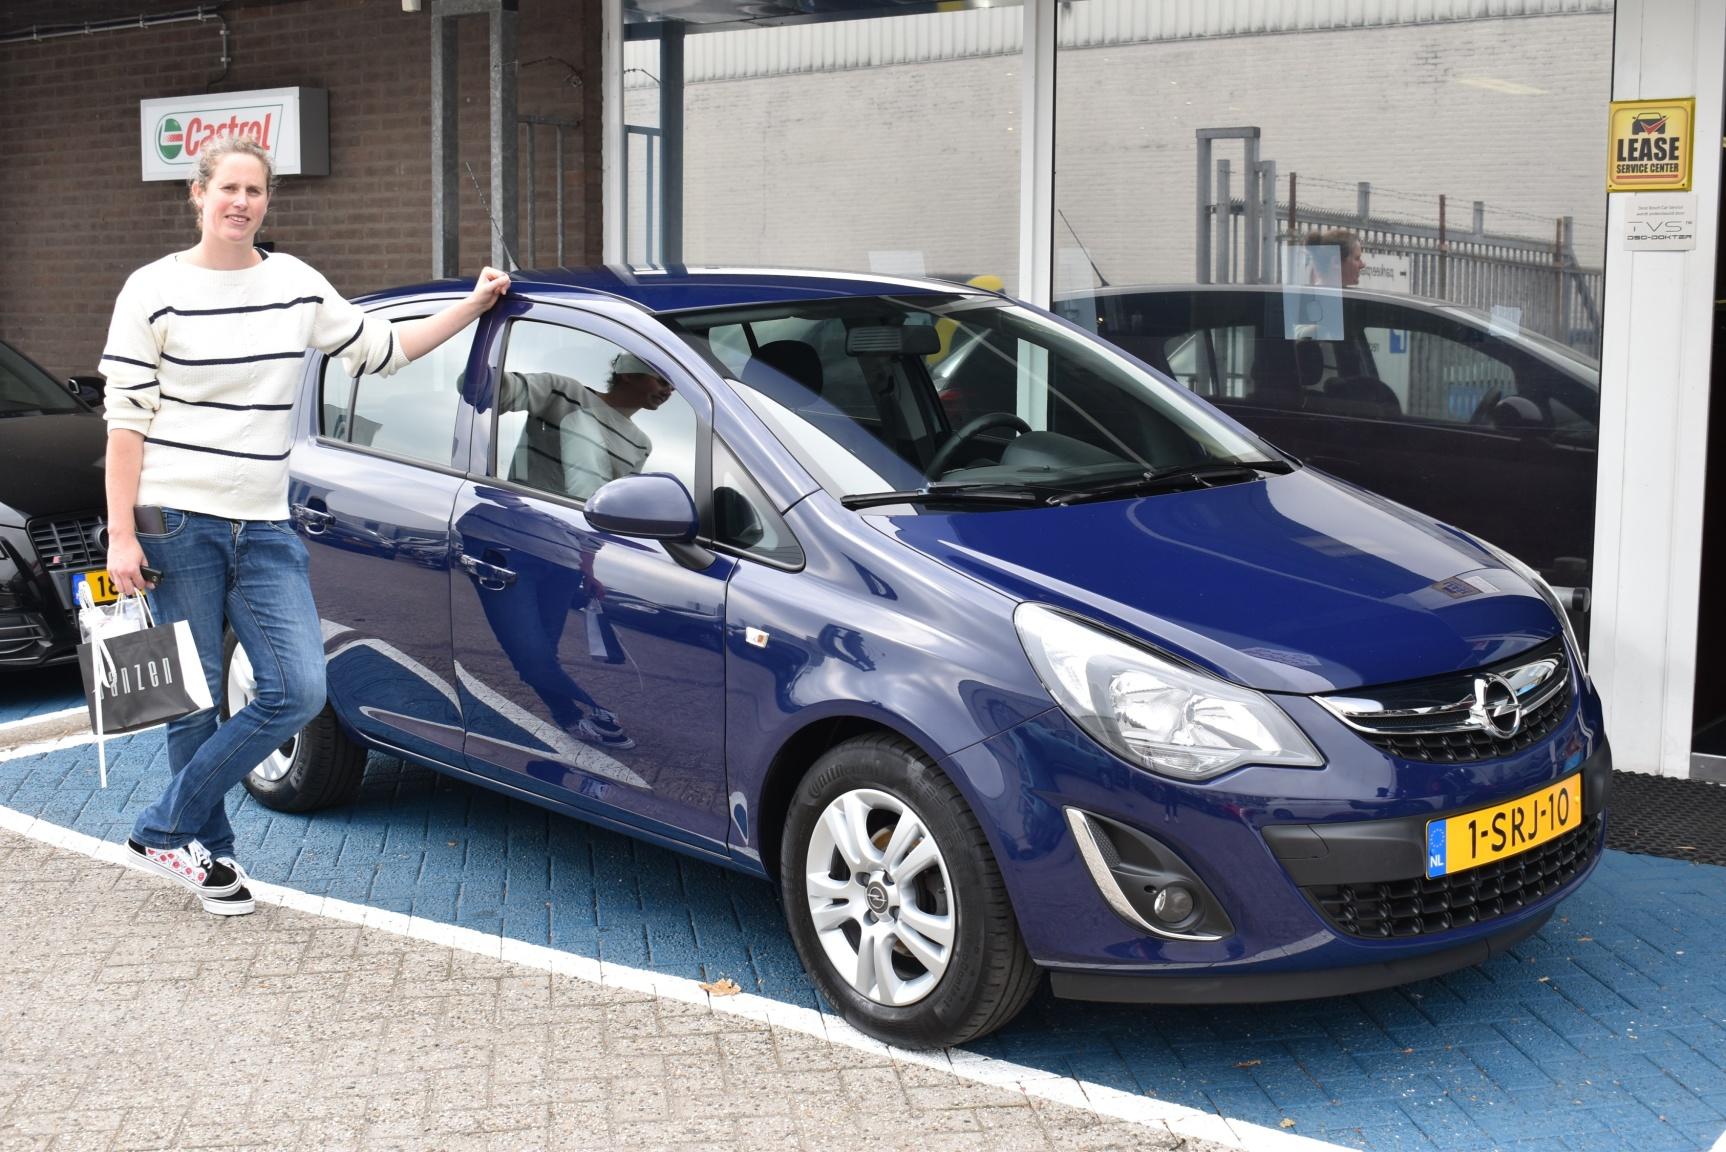 Aflevering Opel Corsa-2021-09-30 15:49:03